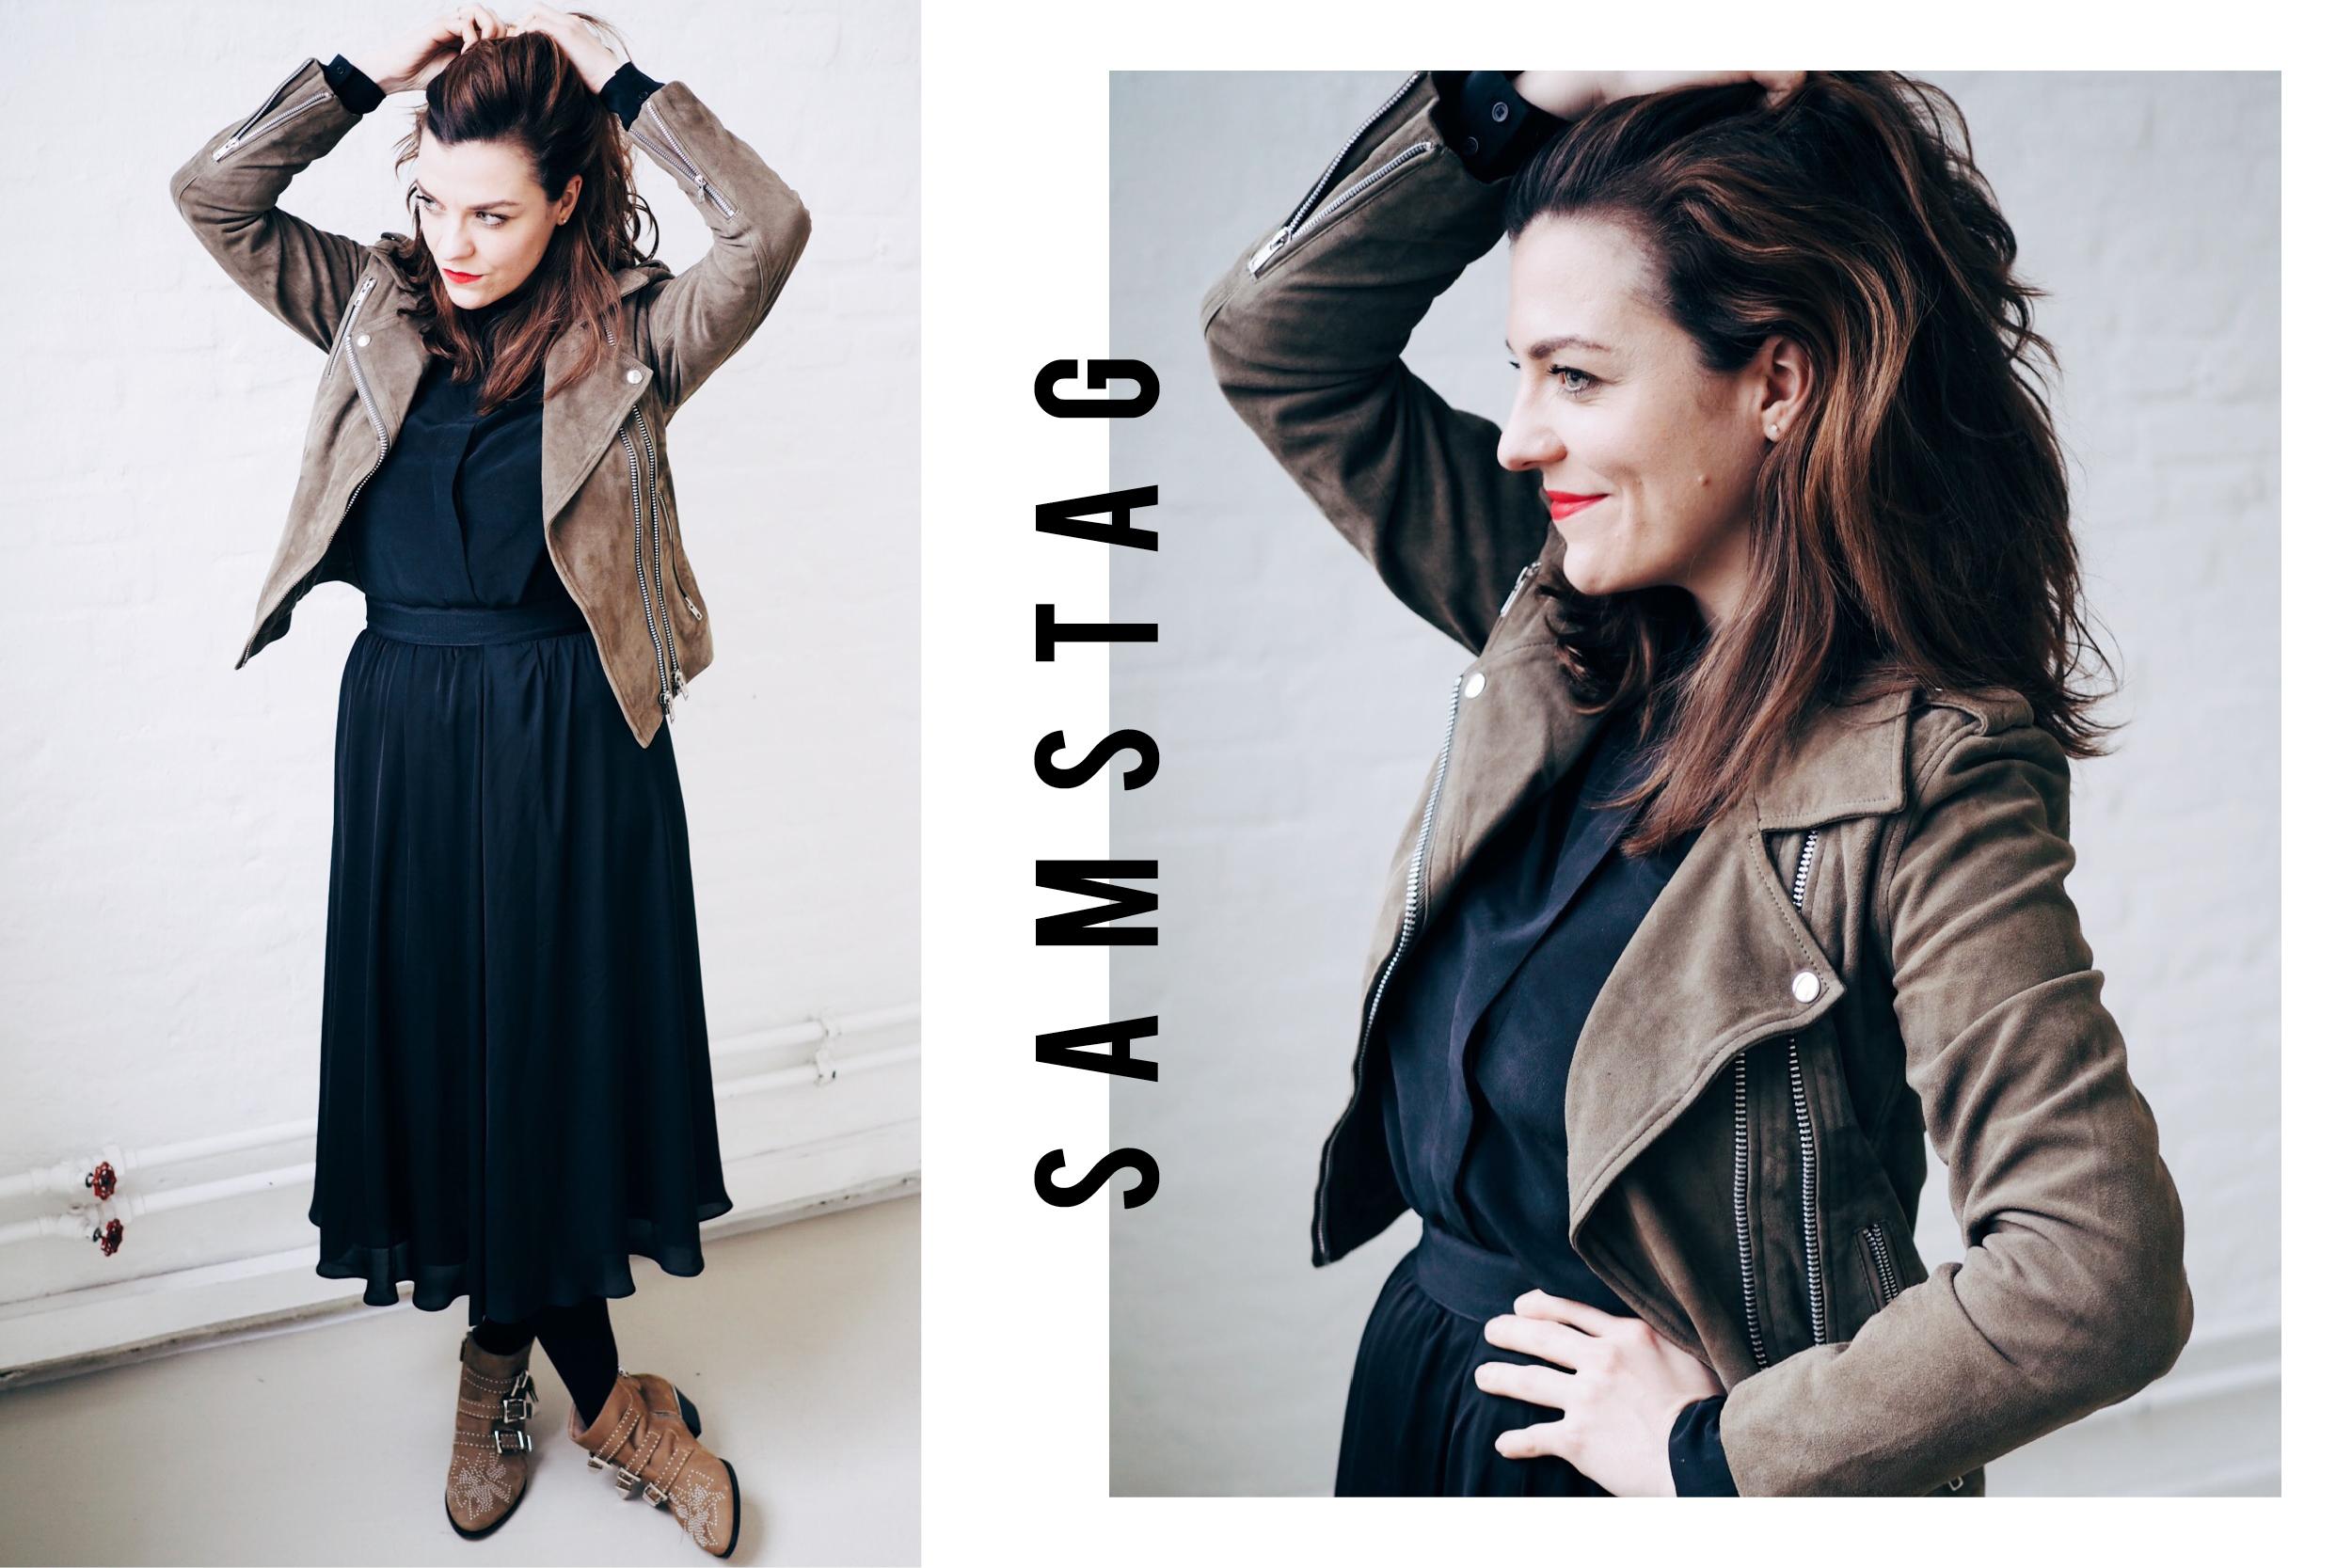 7 Days No Jeans / 7 Looks / Foxycheeks Hanna Schumi